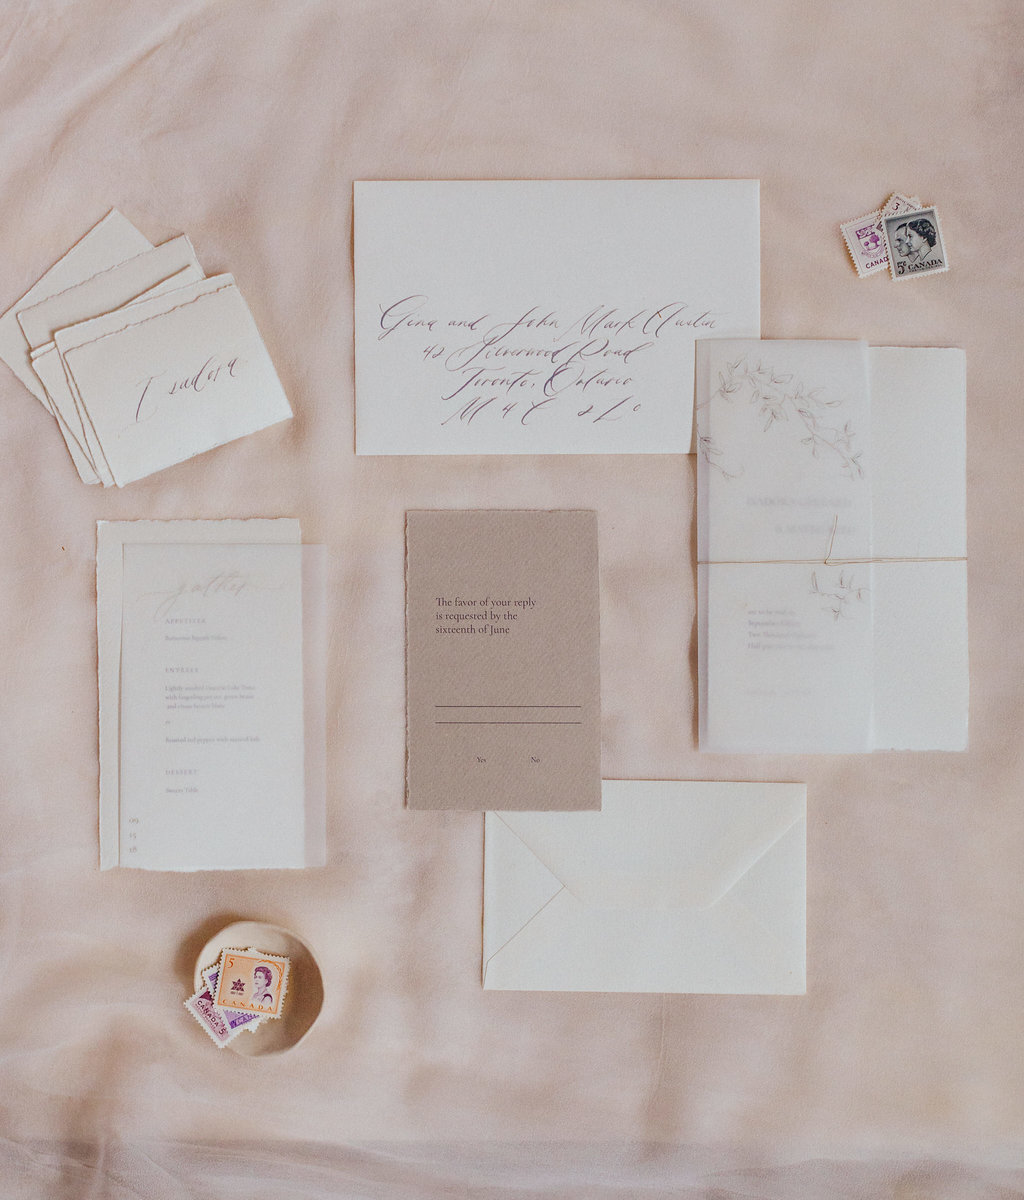 Blush-and-Bowties-Minimalist-Artisinal-Christine-Lim-001.JPG